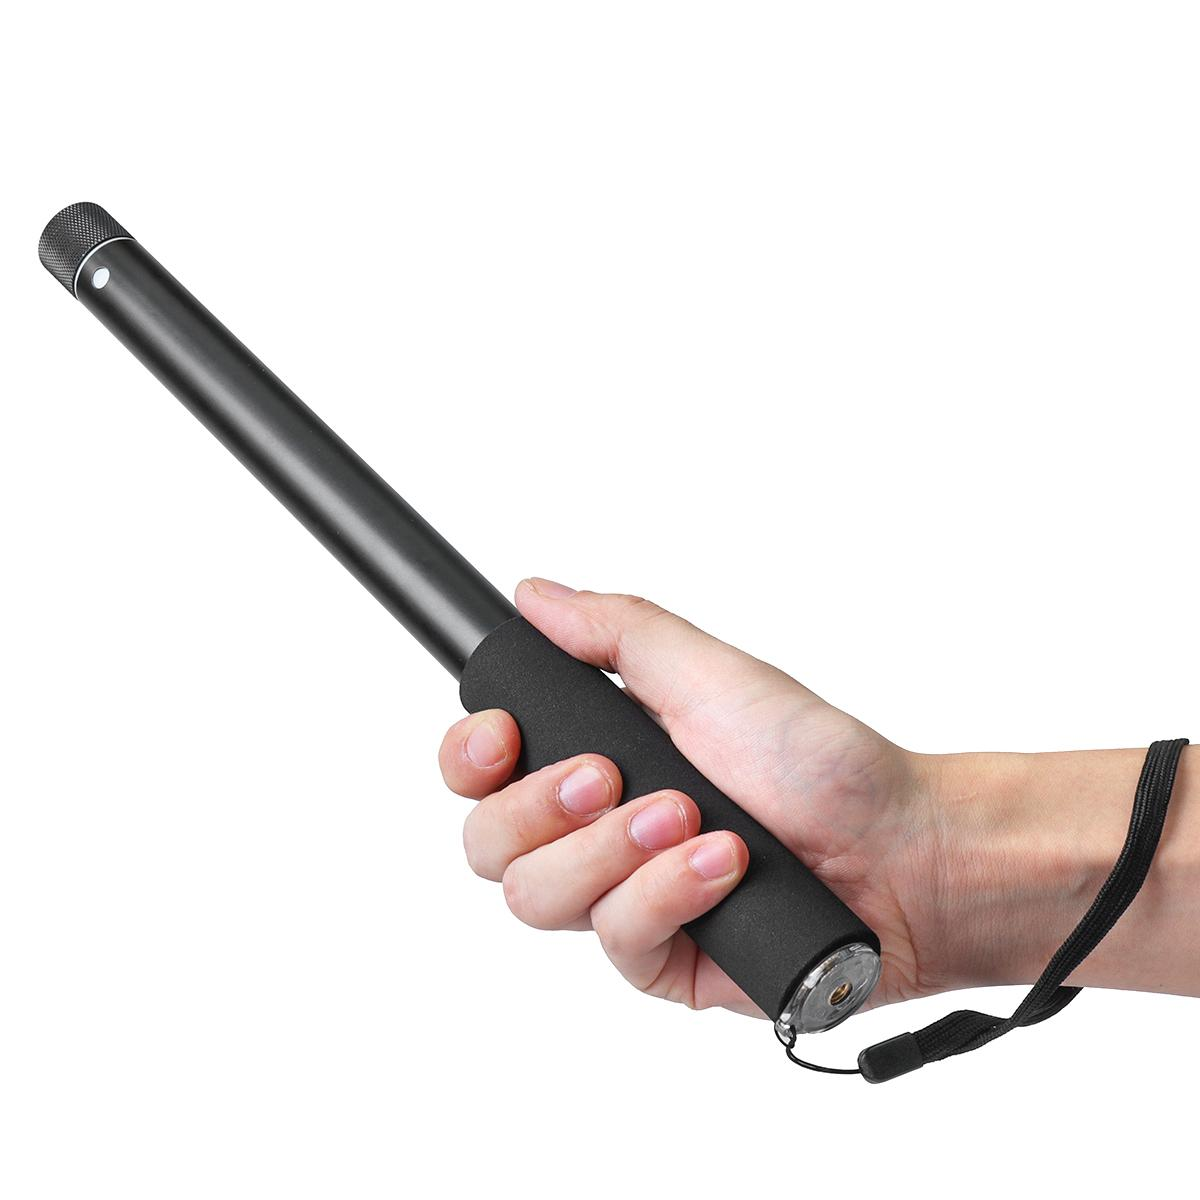 Mikrofon Boom Pole Extensible Boom Pole Micro Mikrofon Pol Mic Halter 3 Abschnitt 67,5 Zoll Verlängerung Aufnahme Zubehör Mikrofonstativ